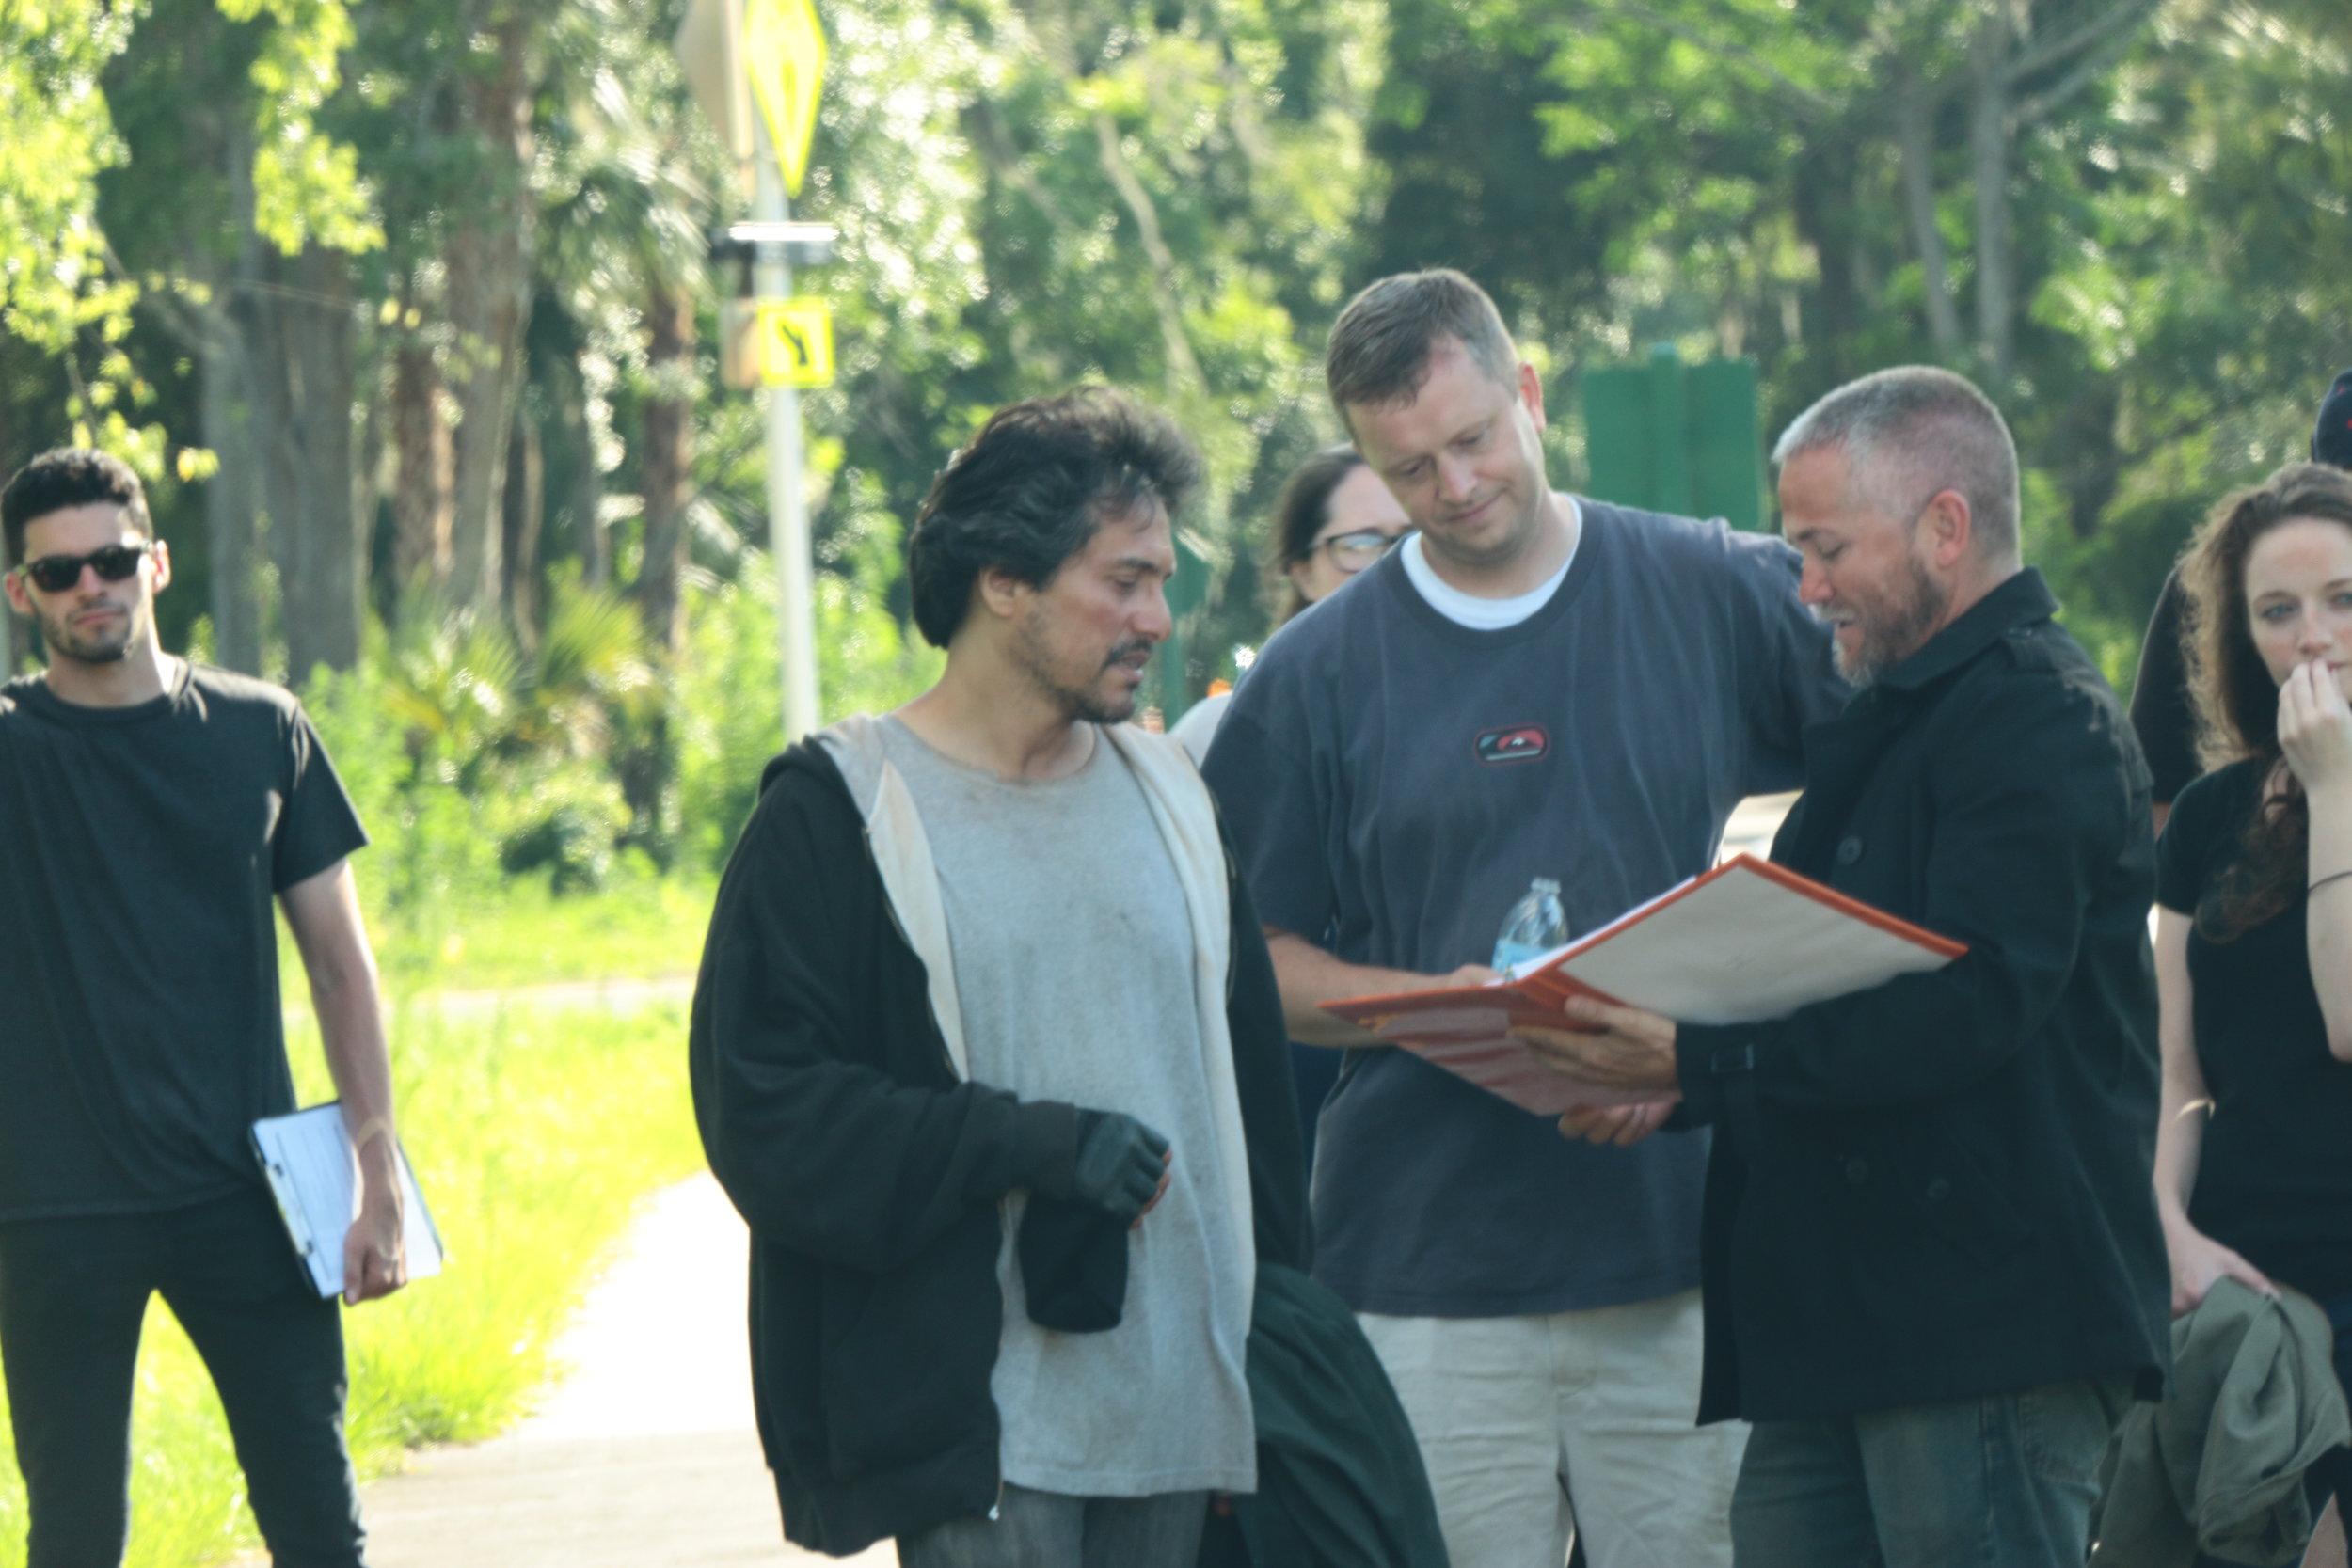 L-R: Assistant director Ariel Zengotita, actor Demi Castro, Director Tim Ritter, actors Robb Maus and Rachel Comeau on location for Testament in 2014    Courtesy of Jason Clarke